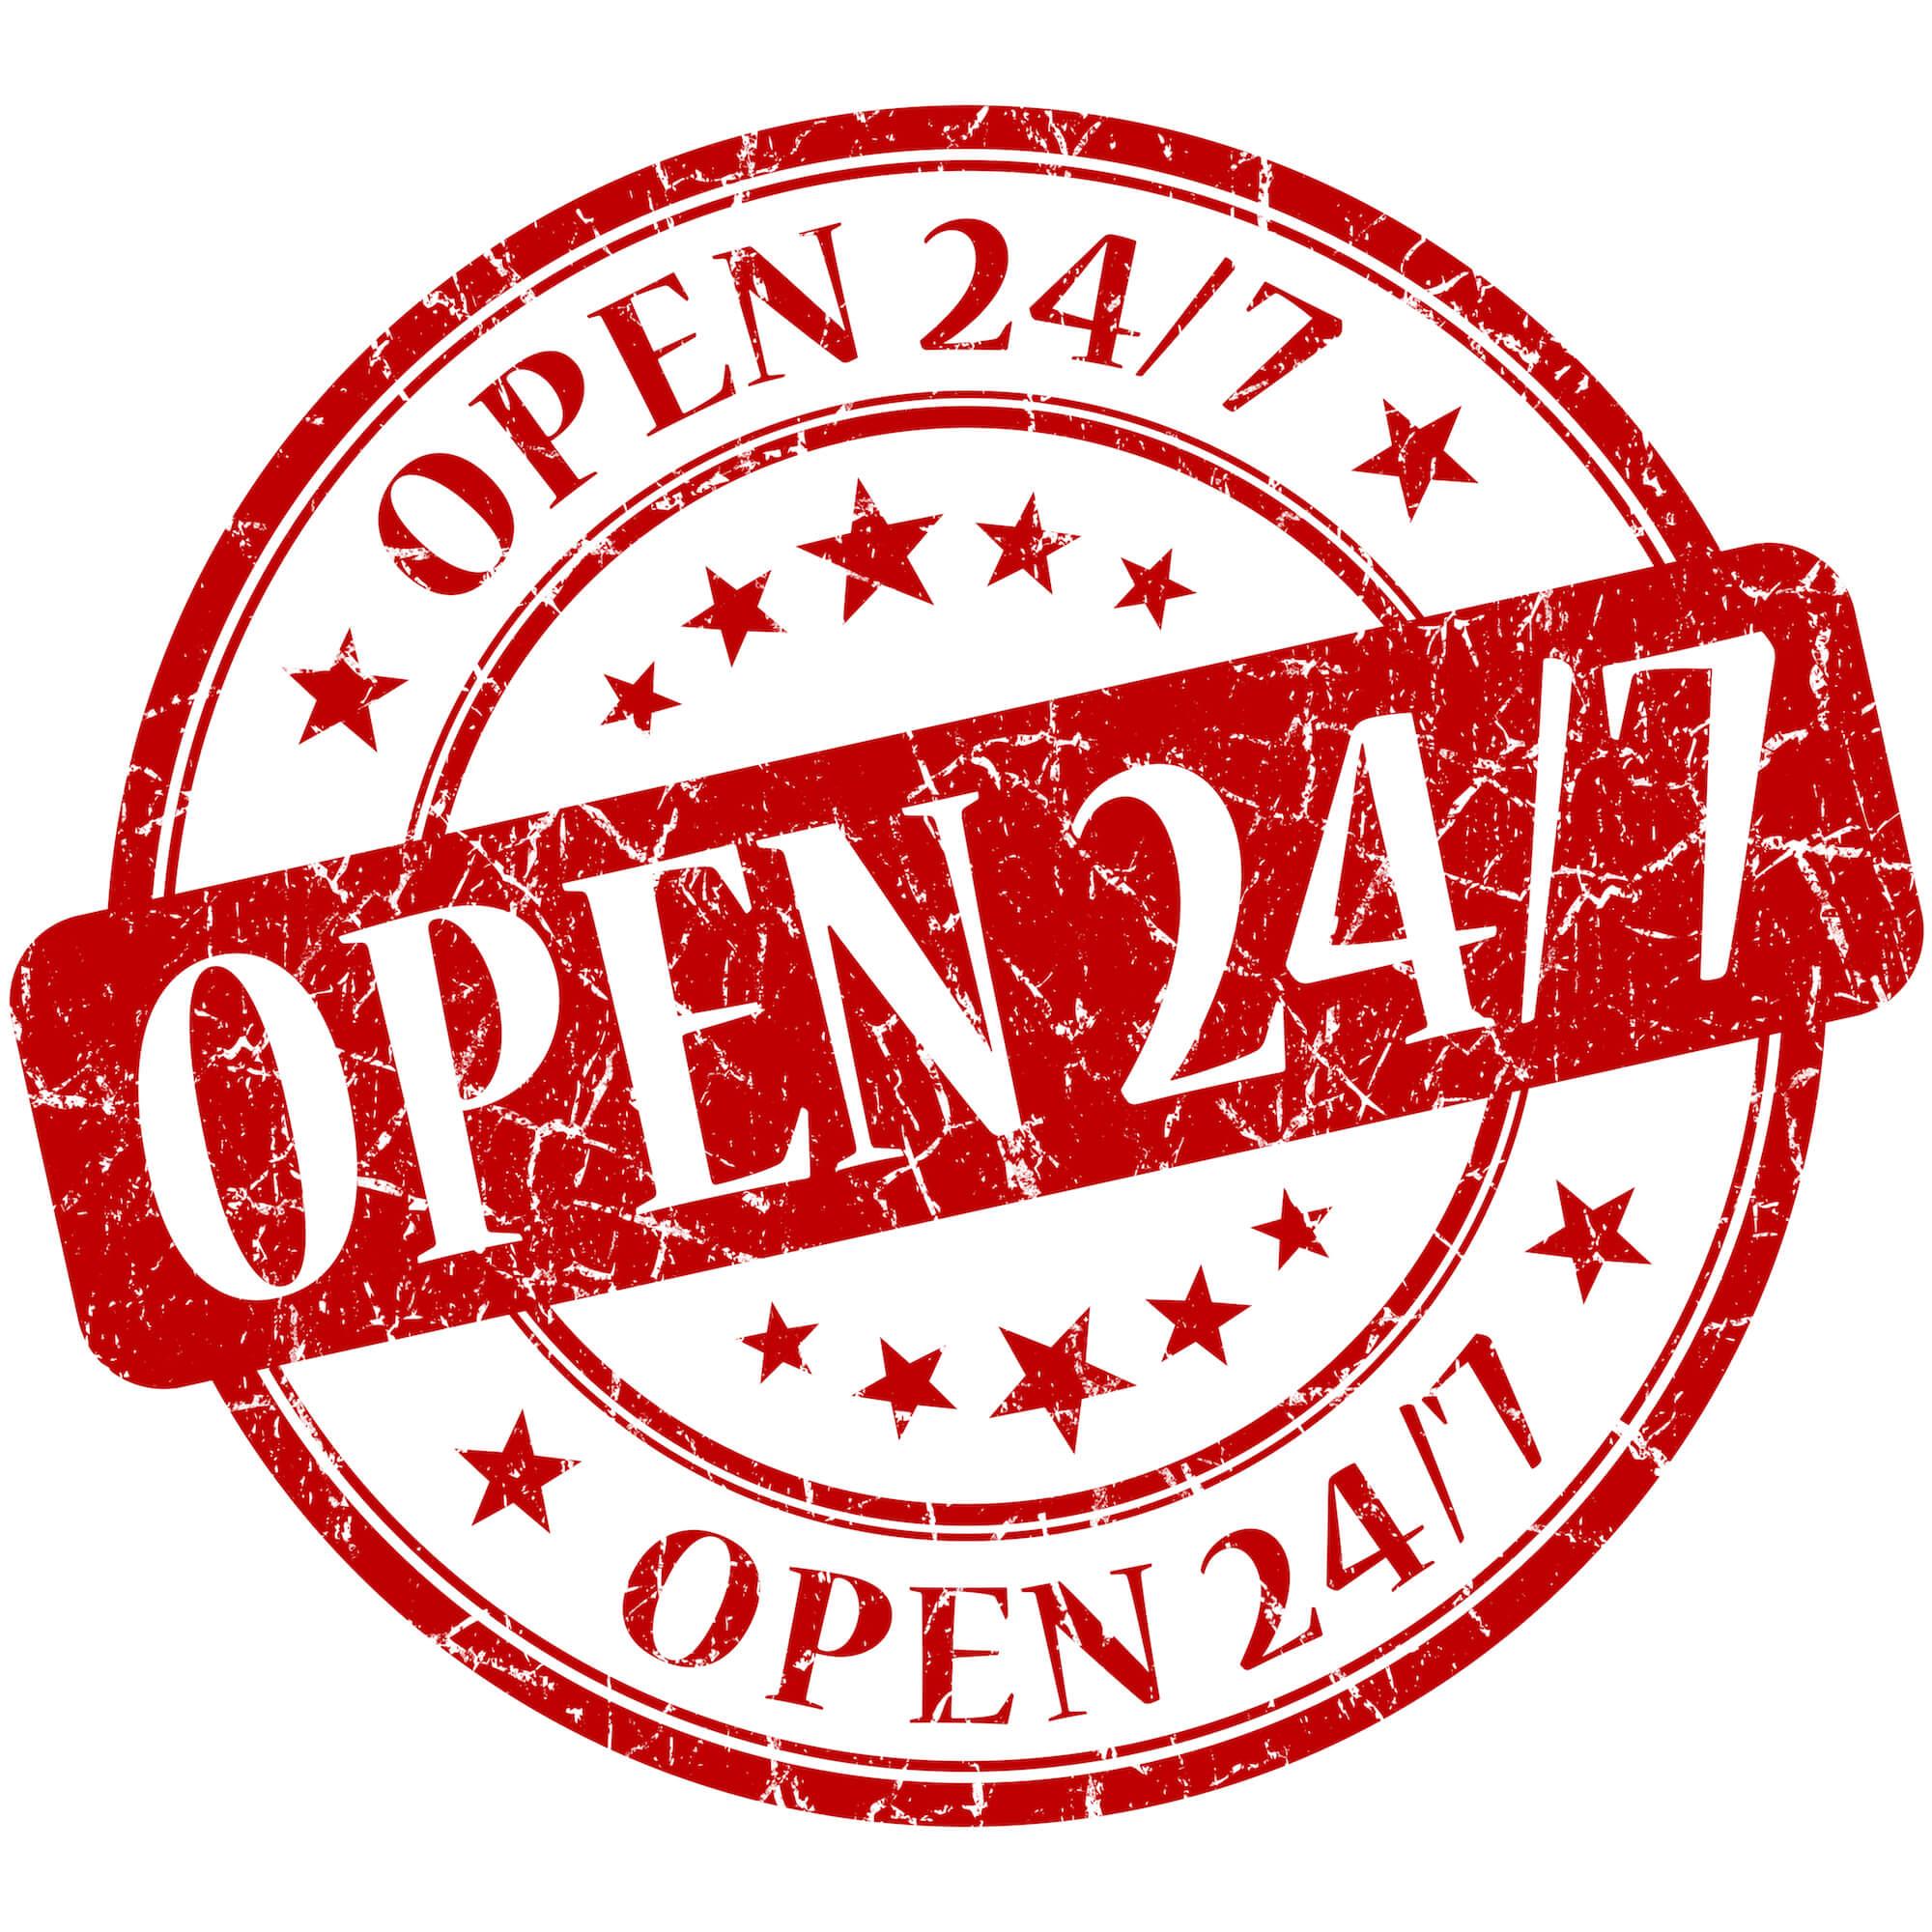 open during coronavirus